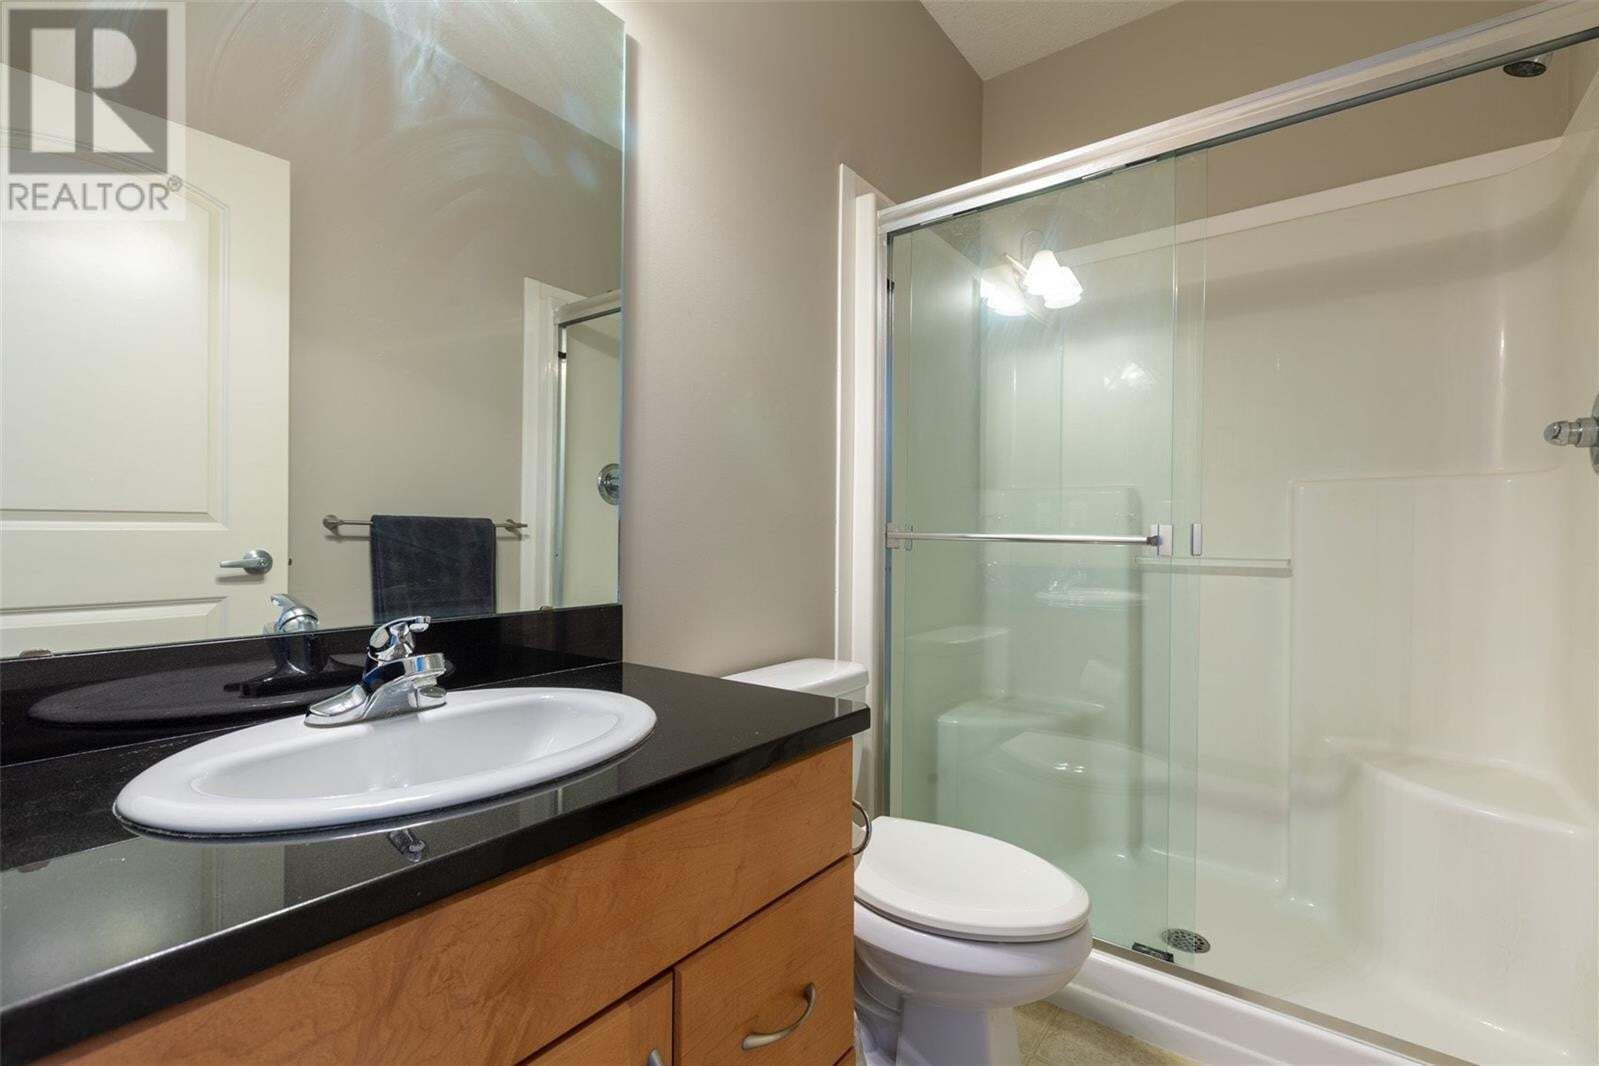 Condo for sale at 2102 Heseltine Rd Unit 109 Regina Saskatchewan - MLS: SK811042